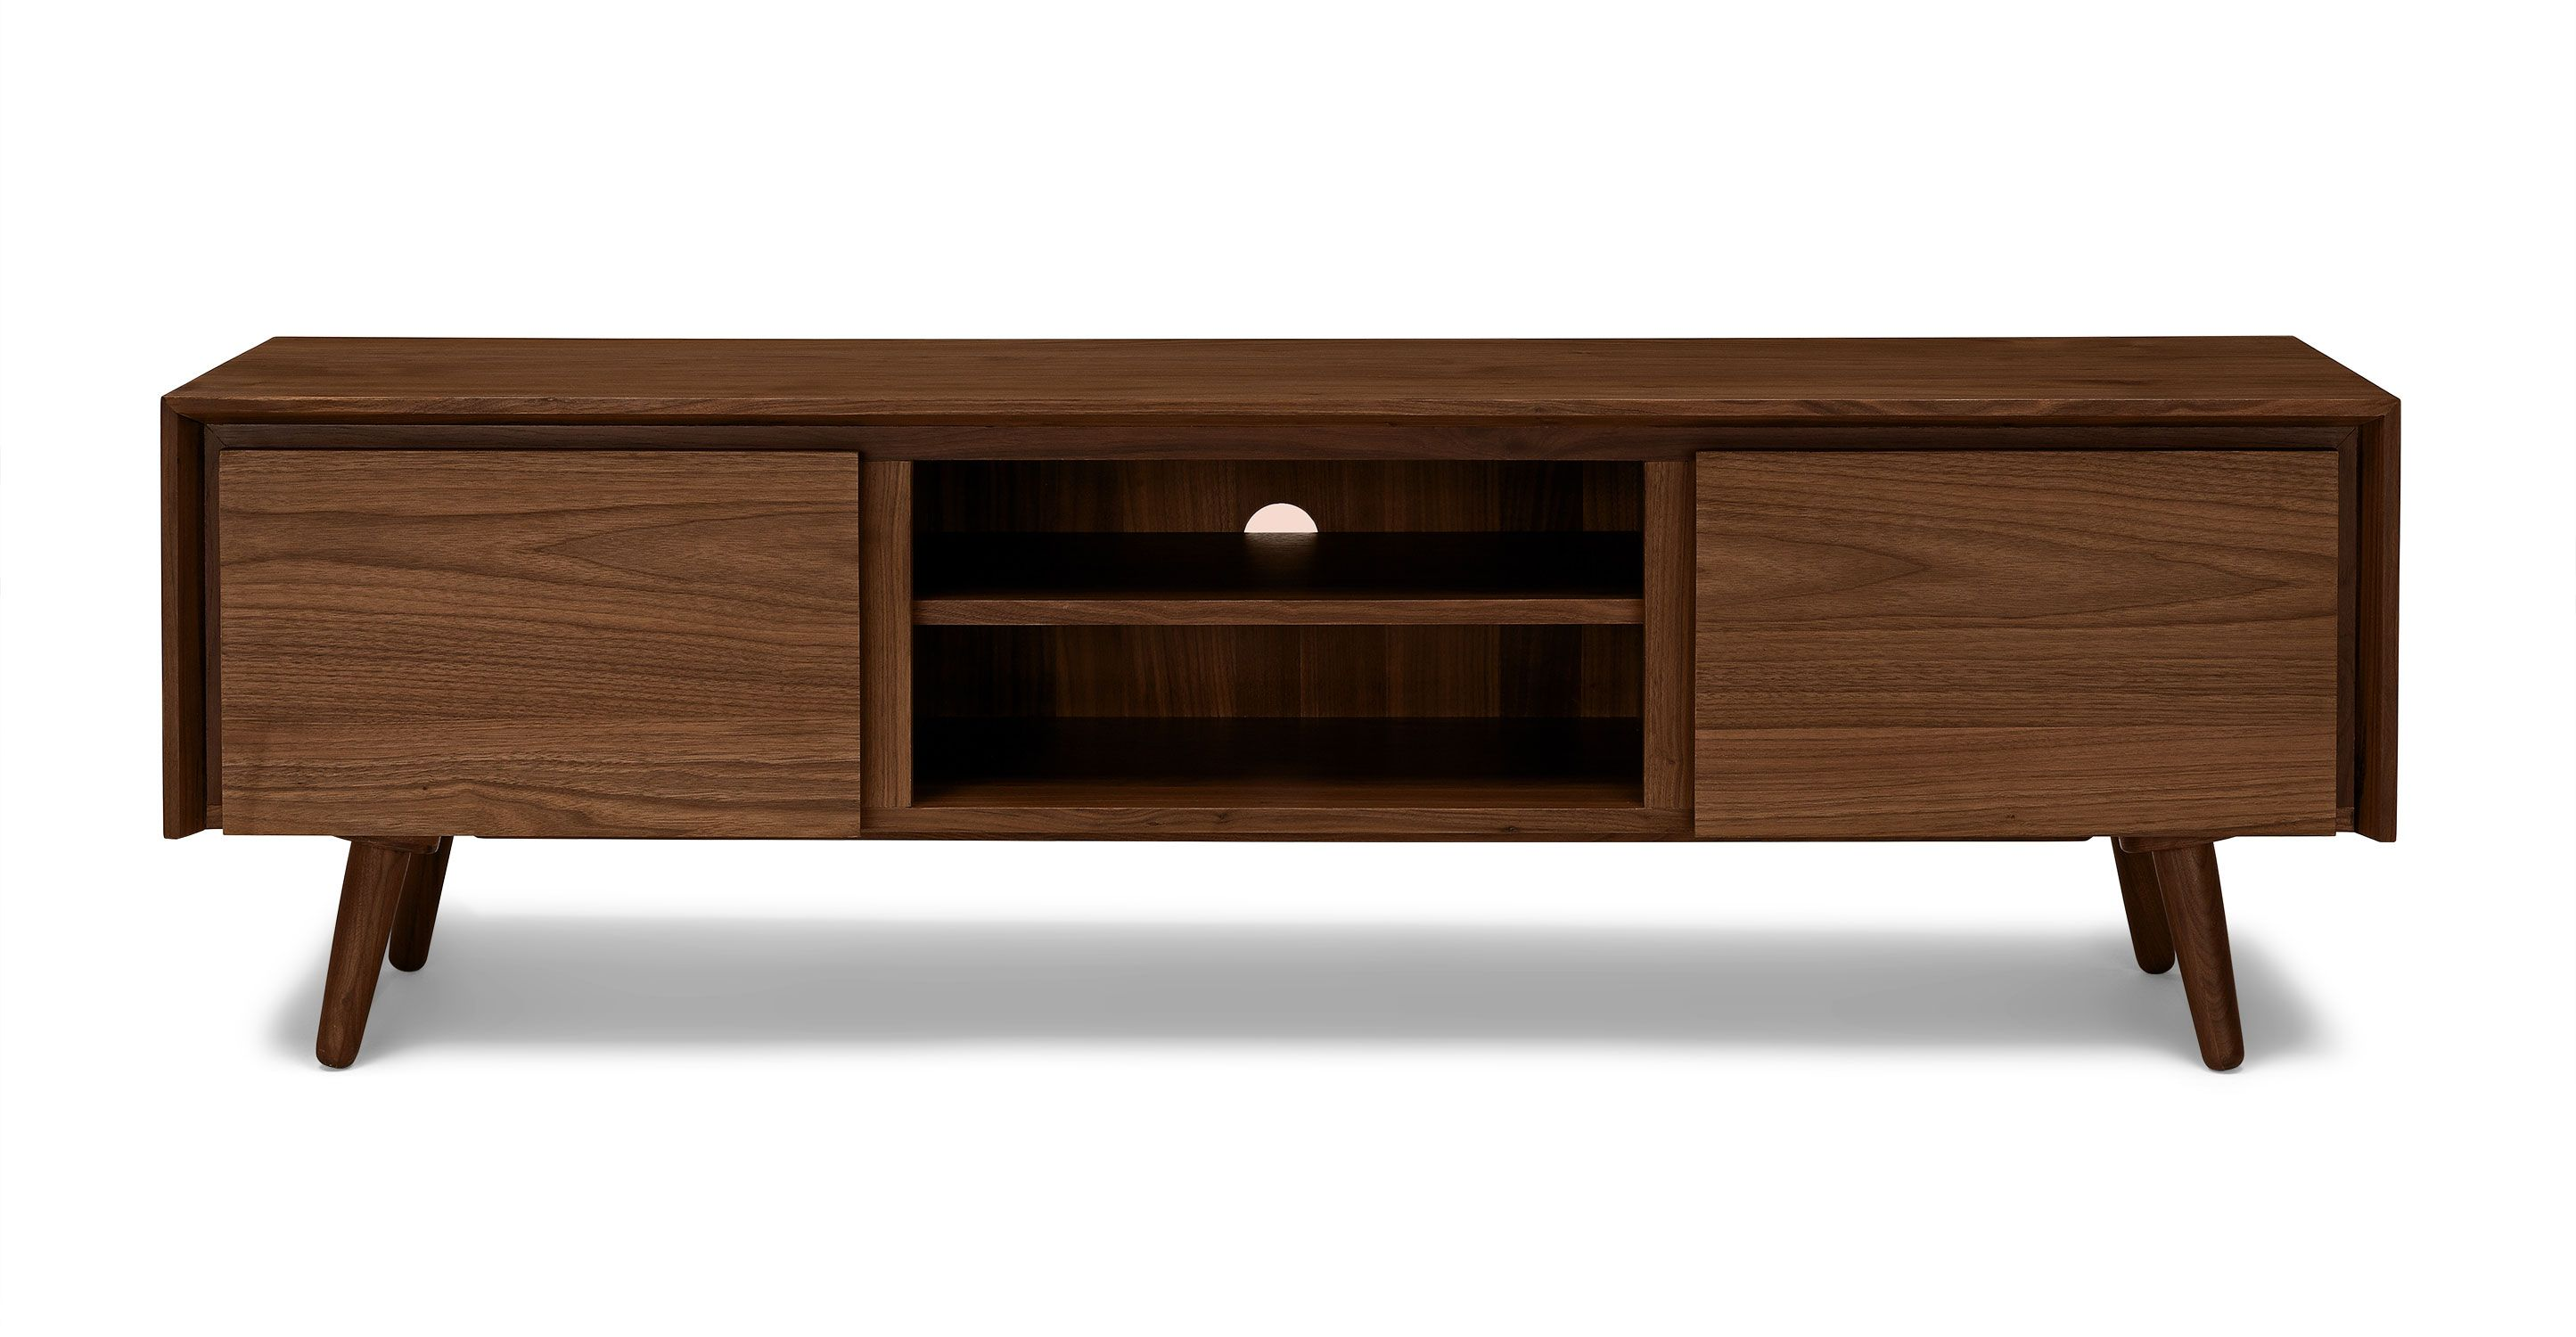 63  Wide TV Unit in Walnut Wood   Article Seno Modern Furniture. 63  Wide TV Unit in Walnut Wood   Article Seno Modern Furniture